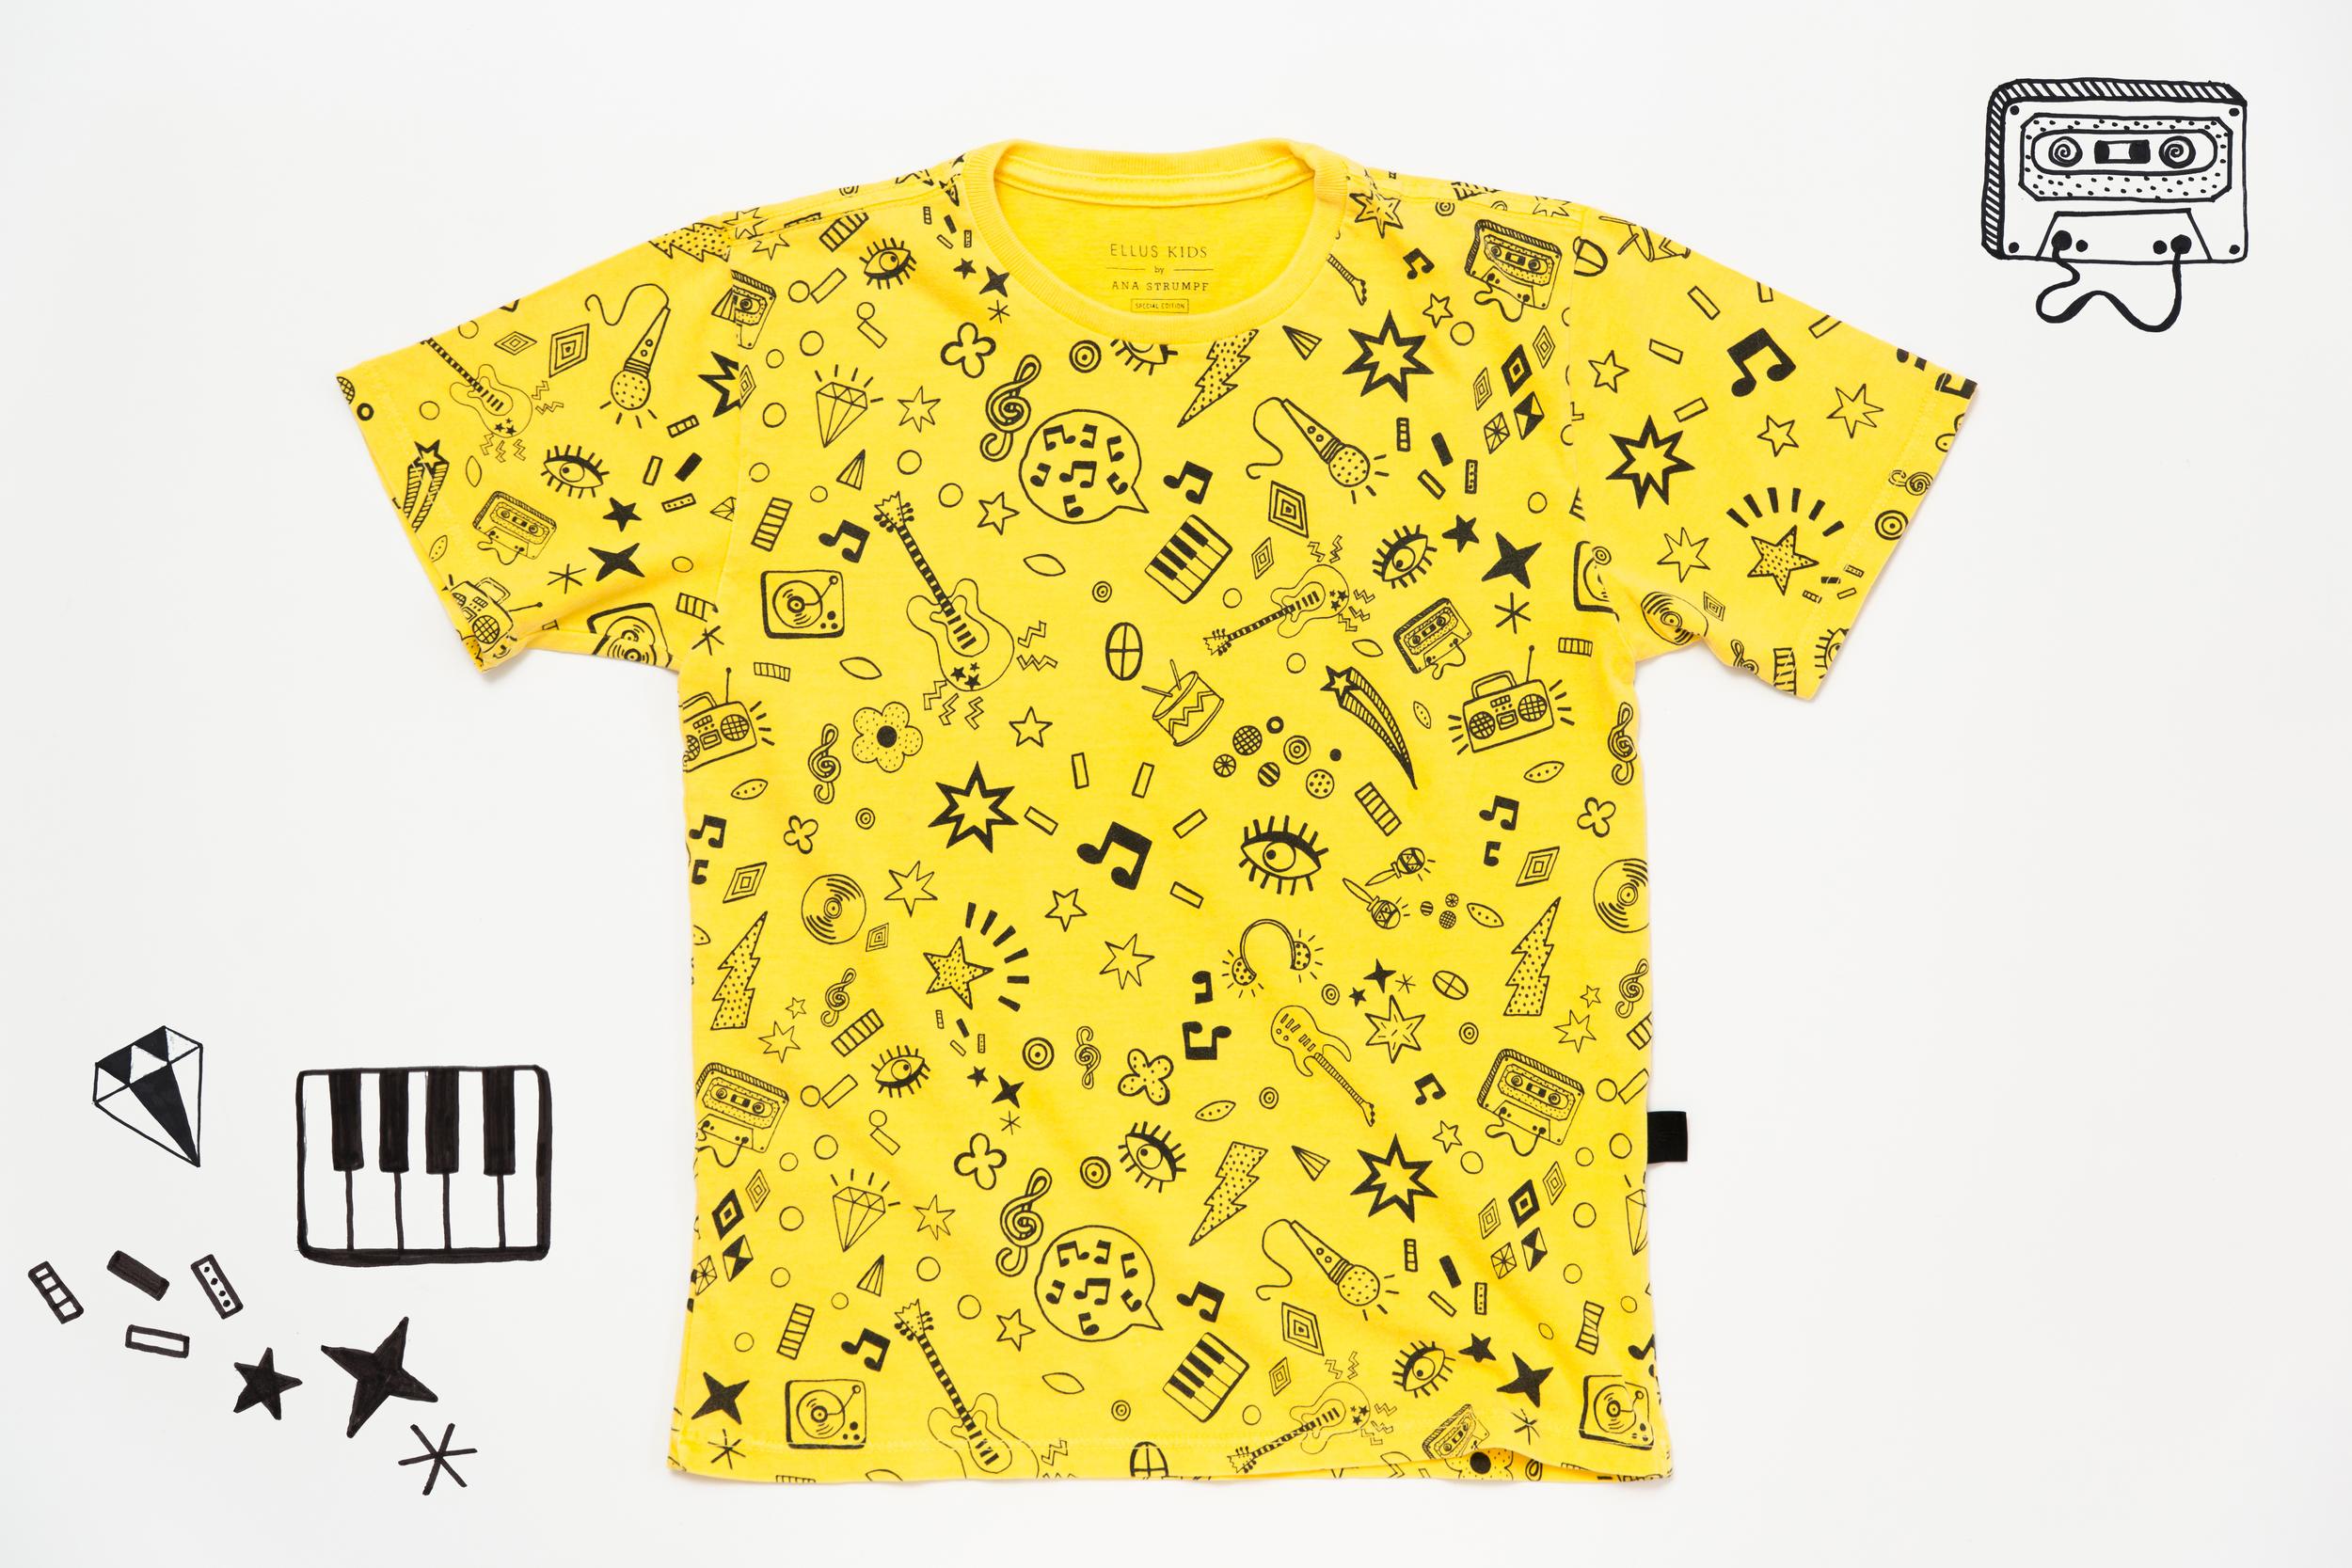 Camiseta amarela.jpg